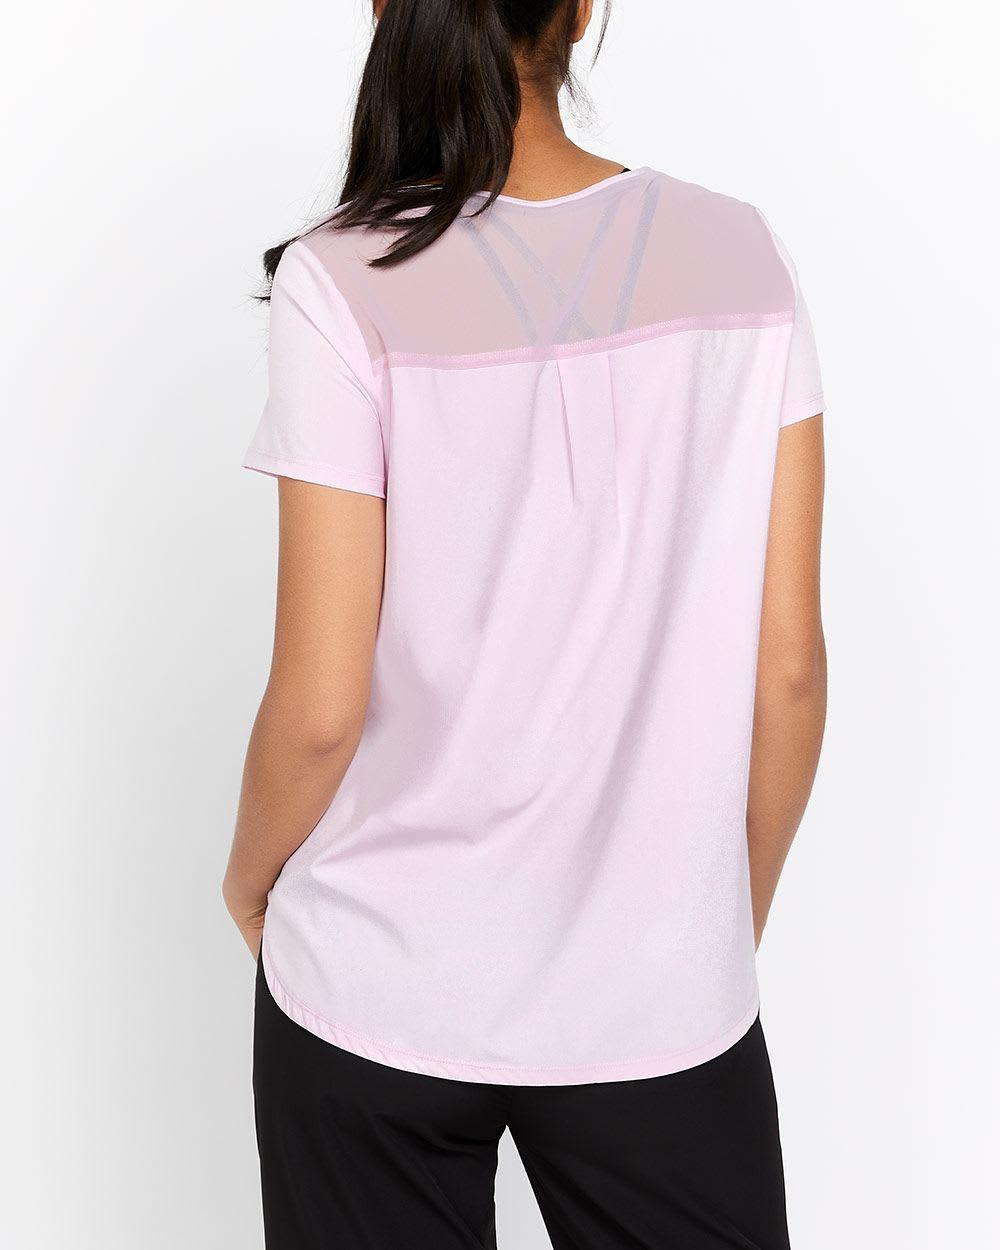 Hyba Mesh T-Shirt